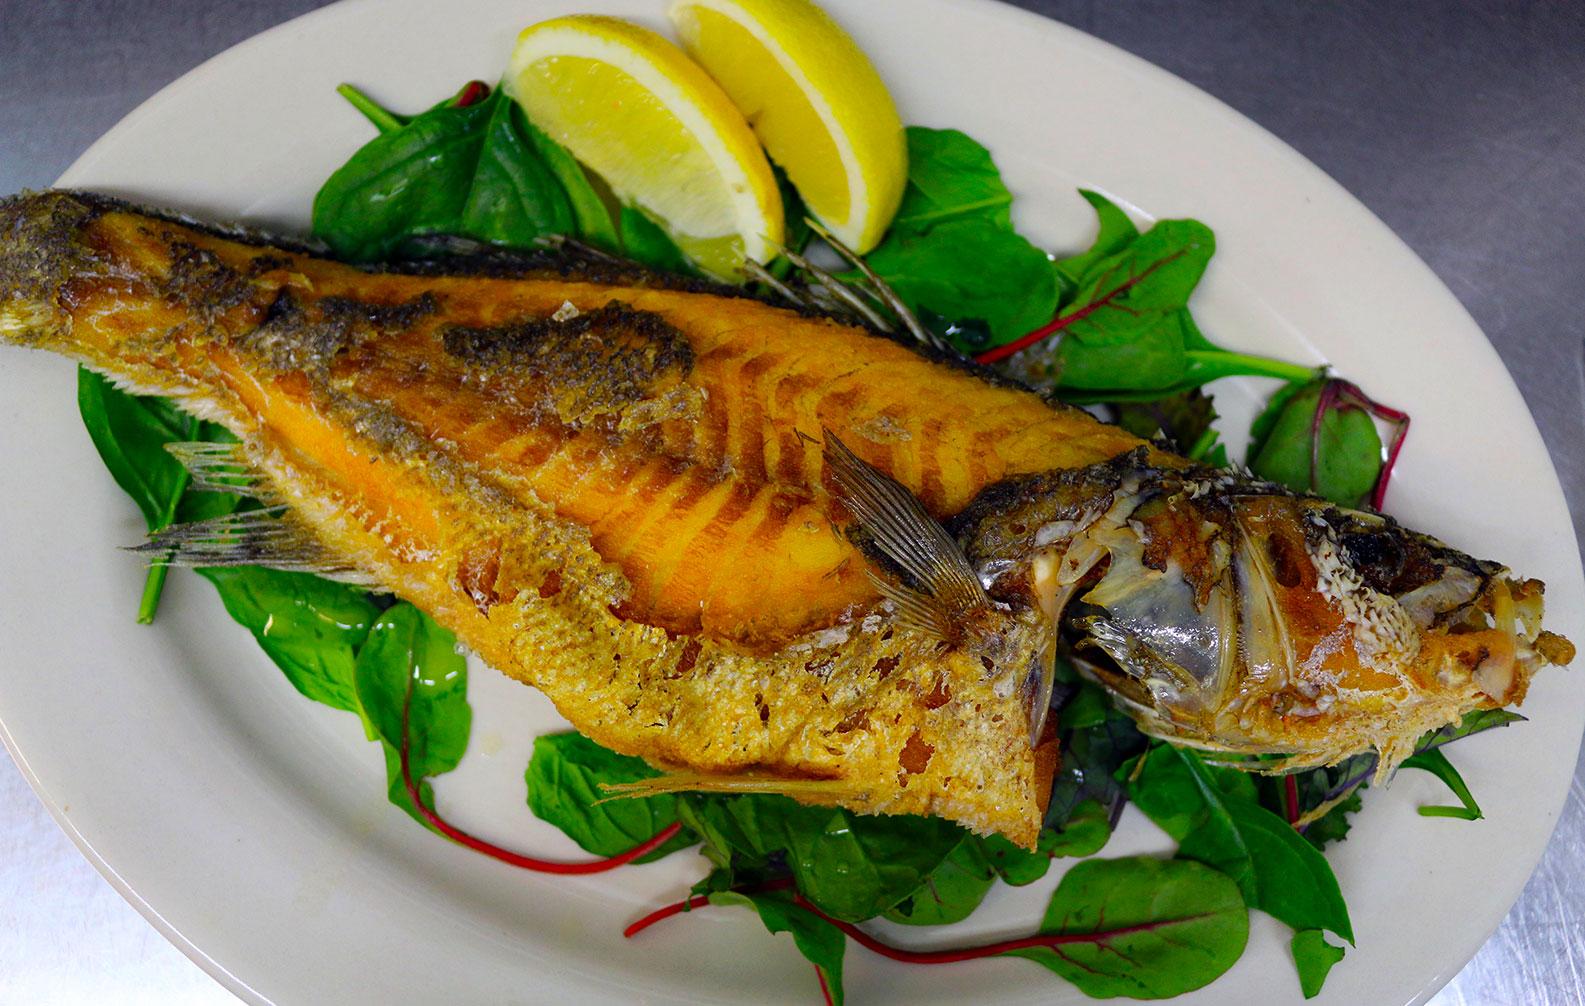 Fish-on-plate.jpg